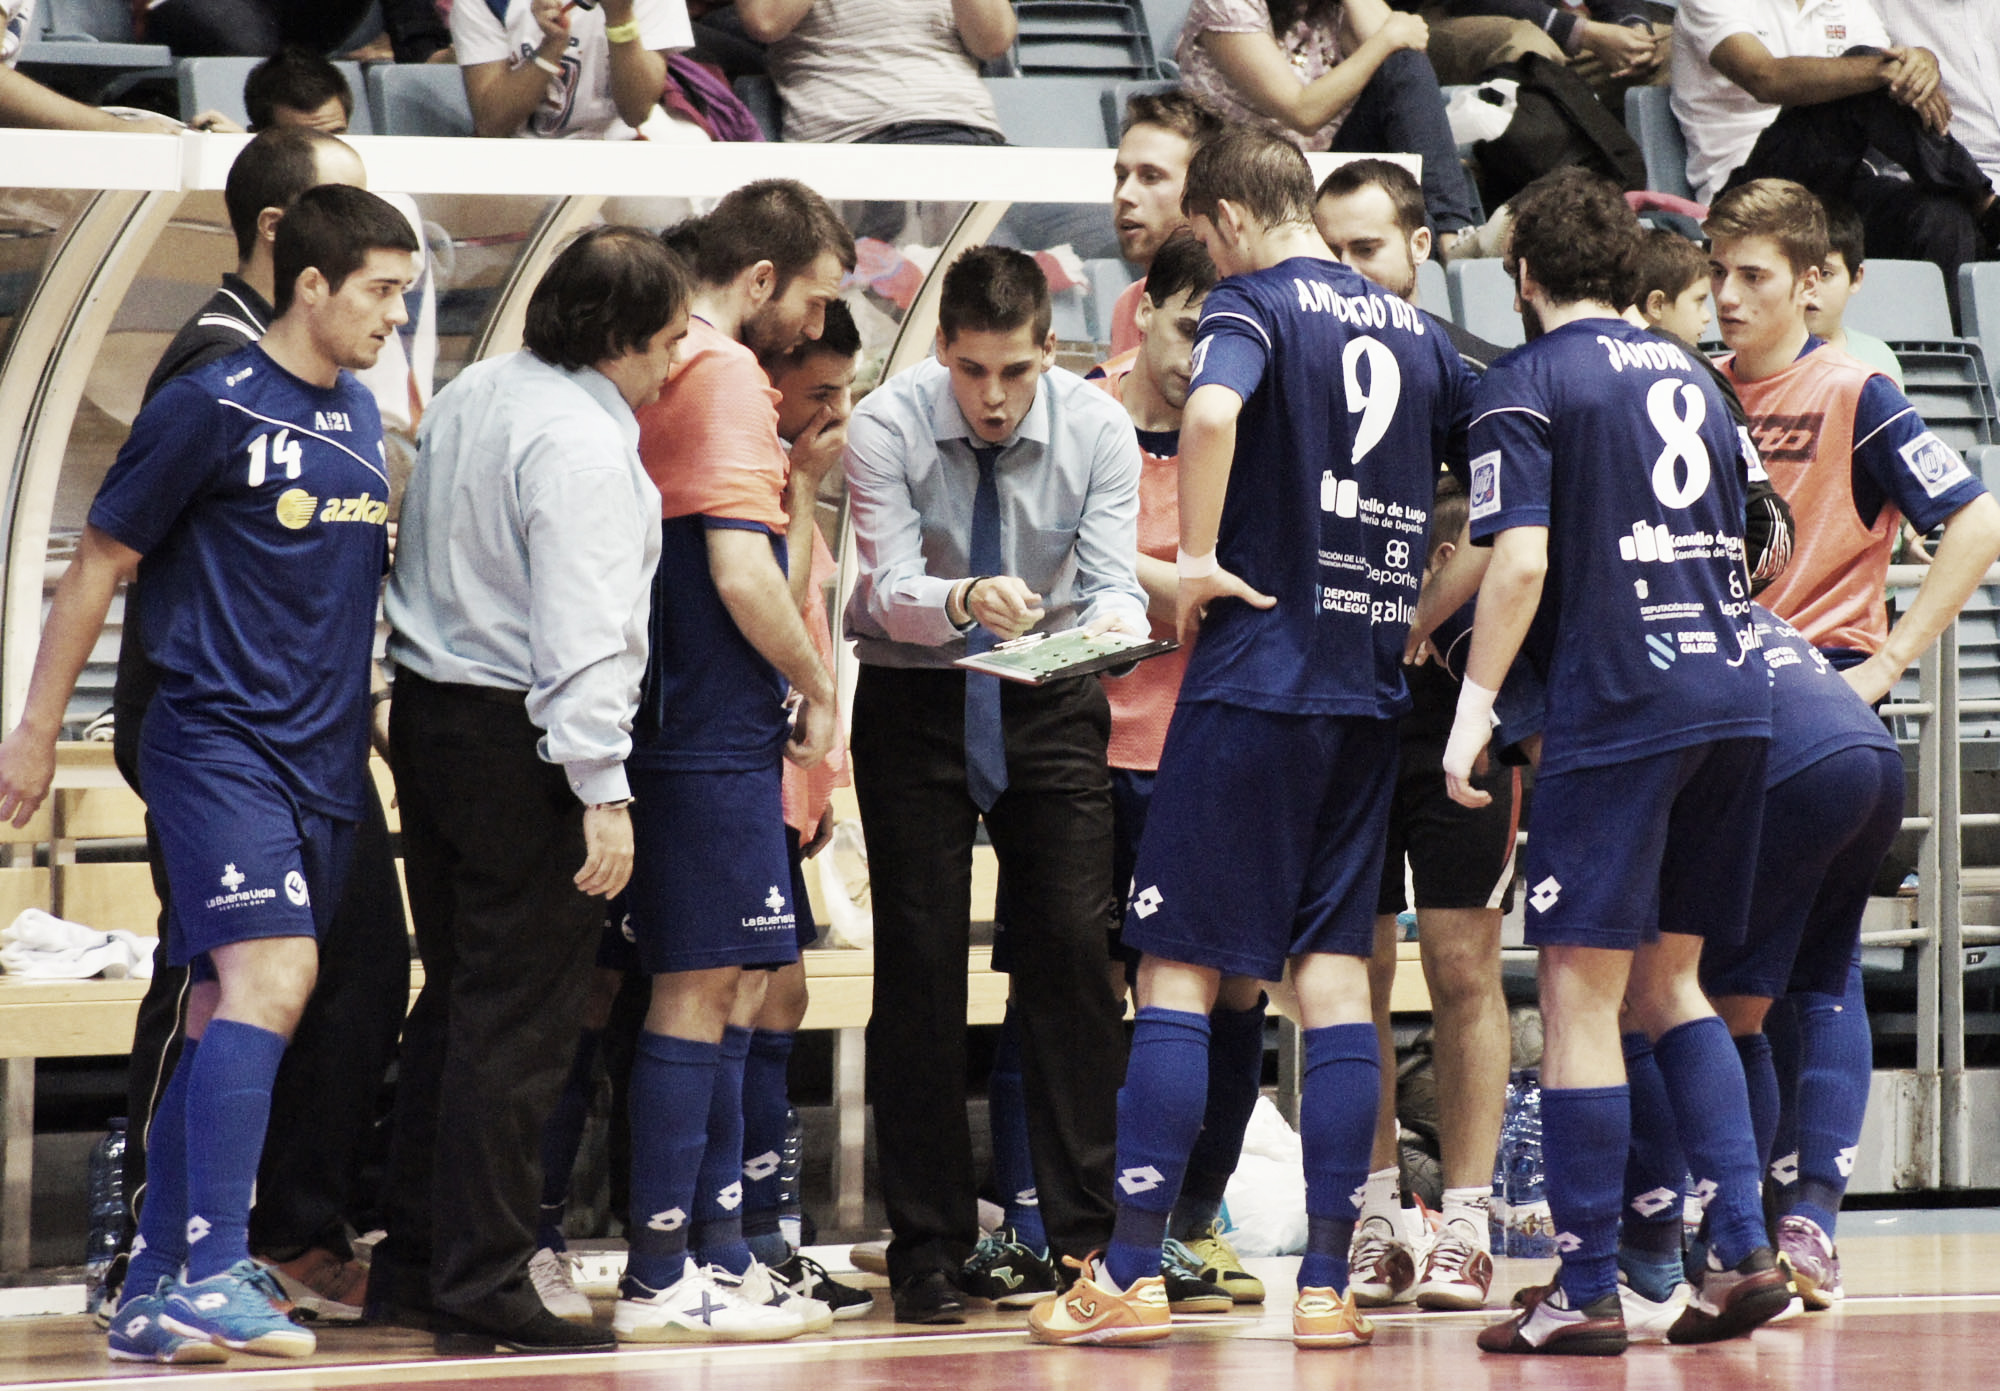 Umacon Zaragoza - Azkar Lugo: aspiraciones de Copa